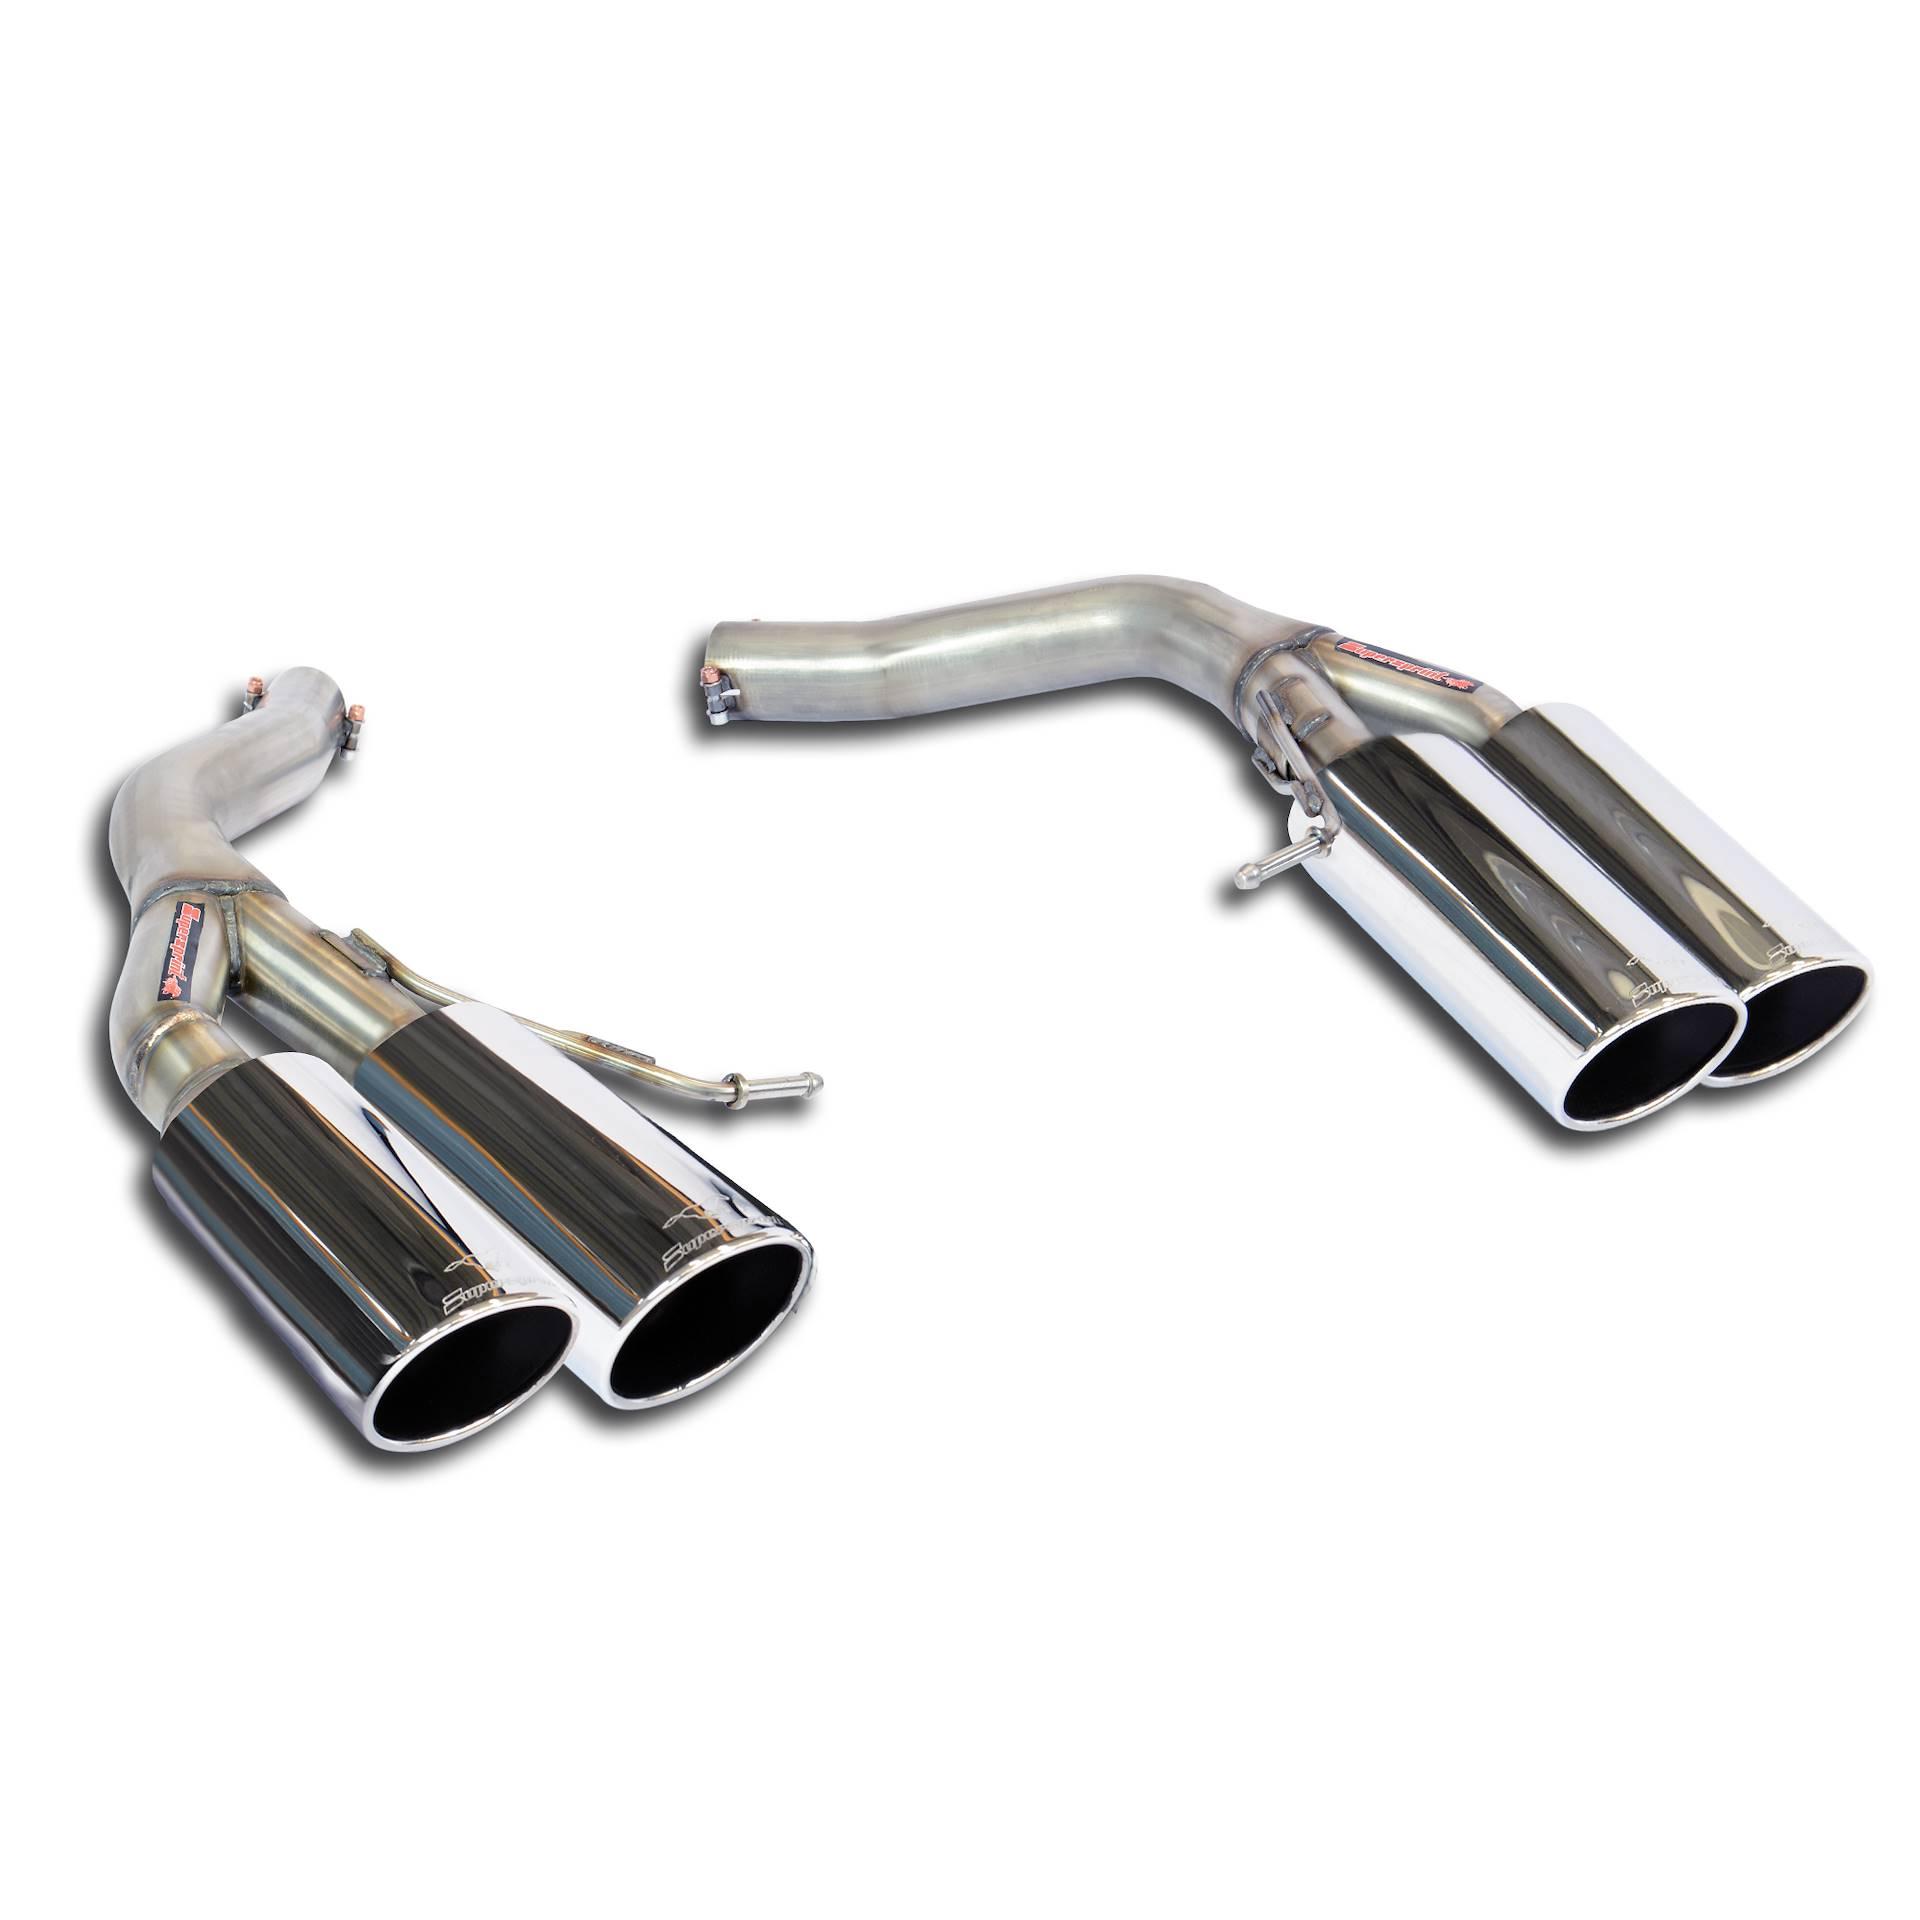 Performance sport exhaust for BMW F12 - F13 640i, BMW F12